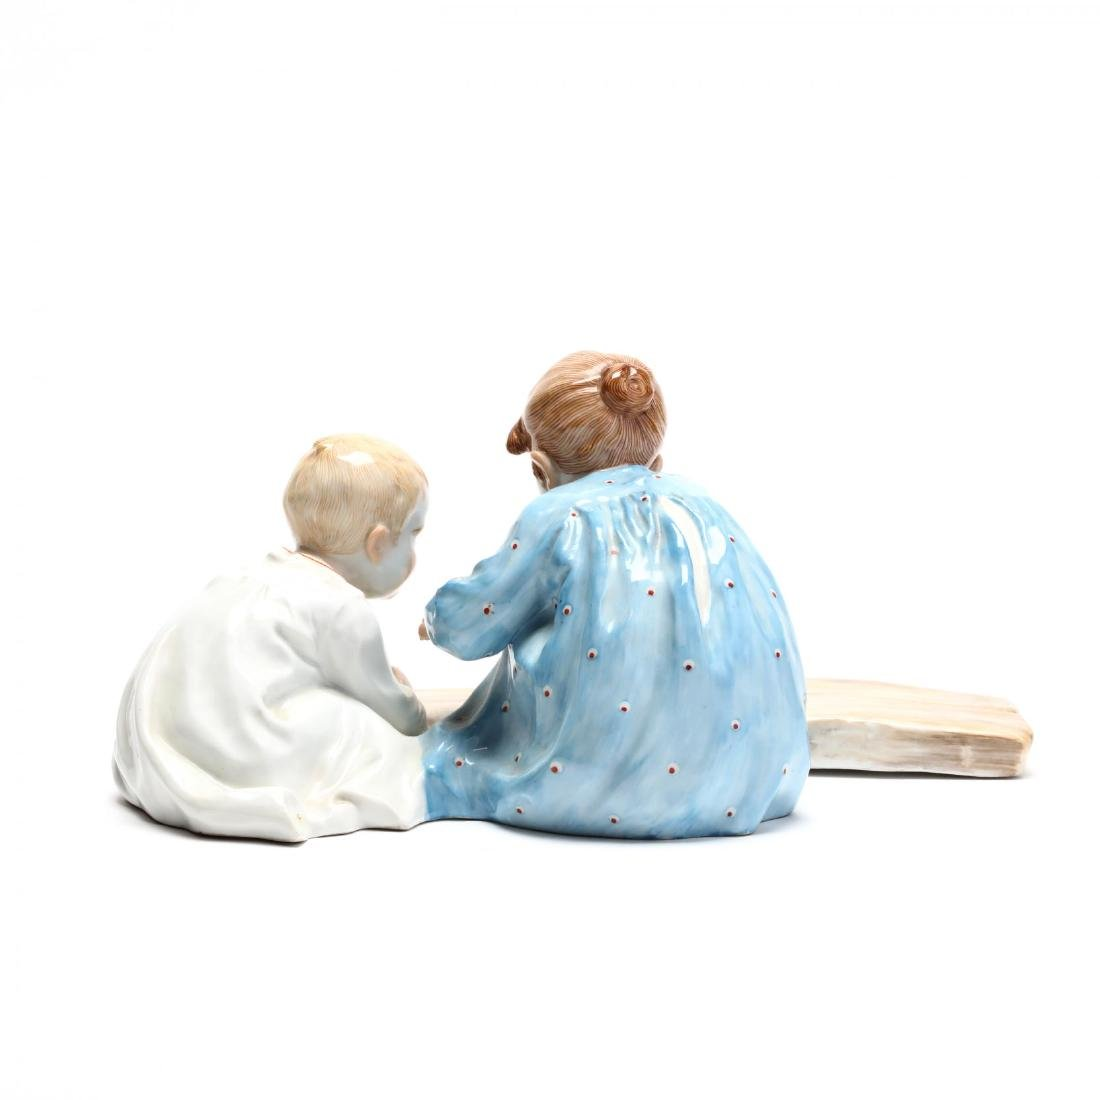 Meissen Hentschel Porcelain Figural Composition - 3